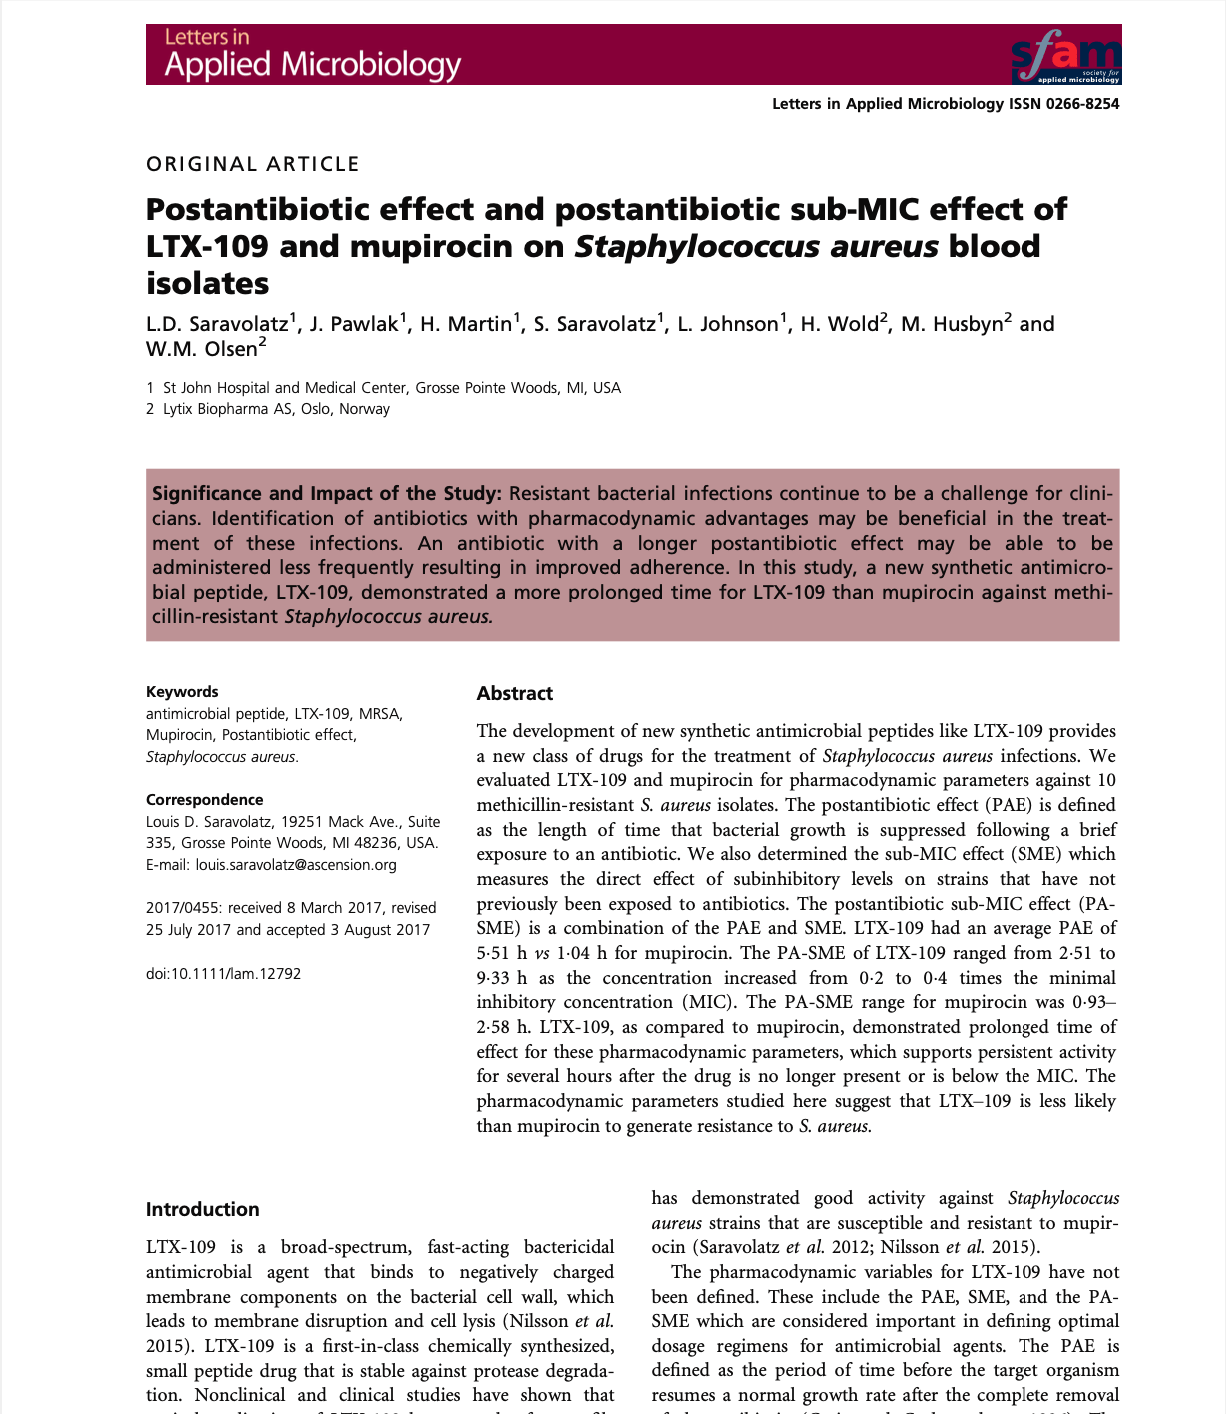 Postantibiotic effect and postantibiotic sub-MIC effect of LTX-109 and mupirocin on Staphylococcus aureus blood isolates